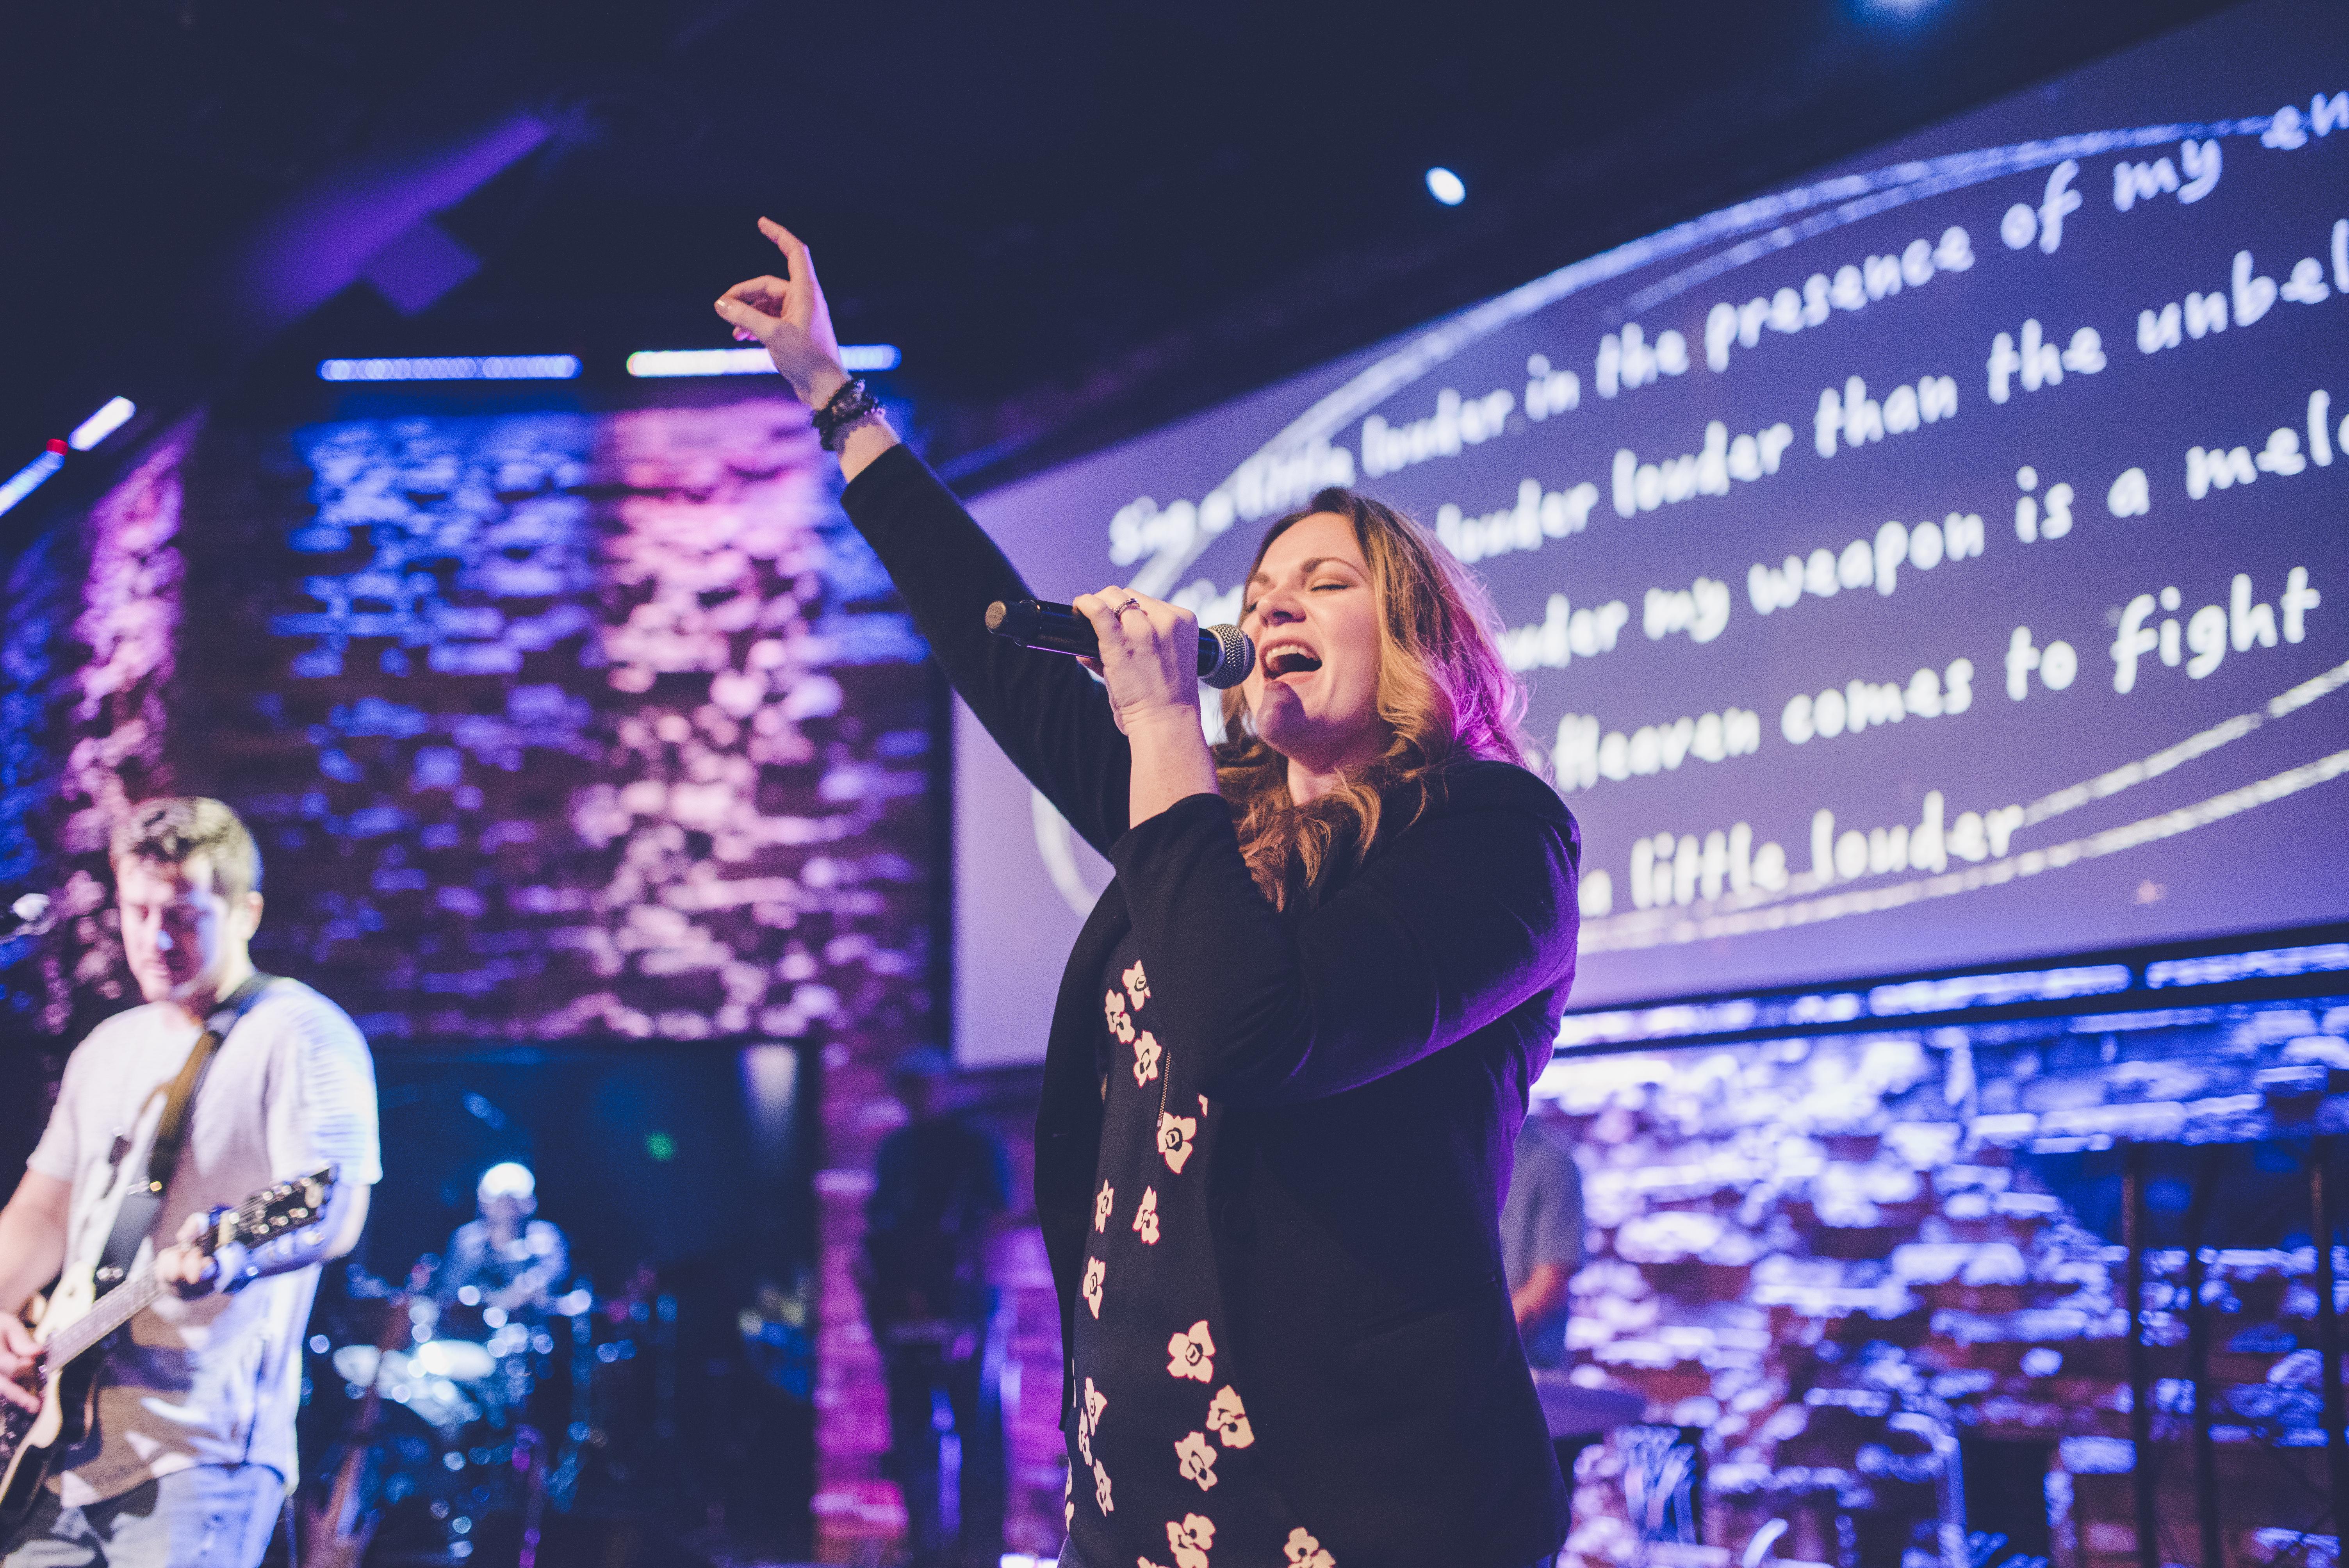 CrossRoads Church NewFire Worship